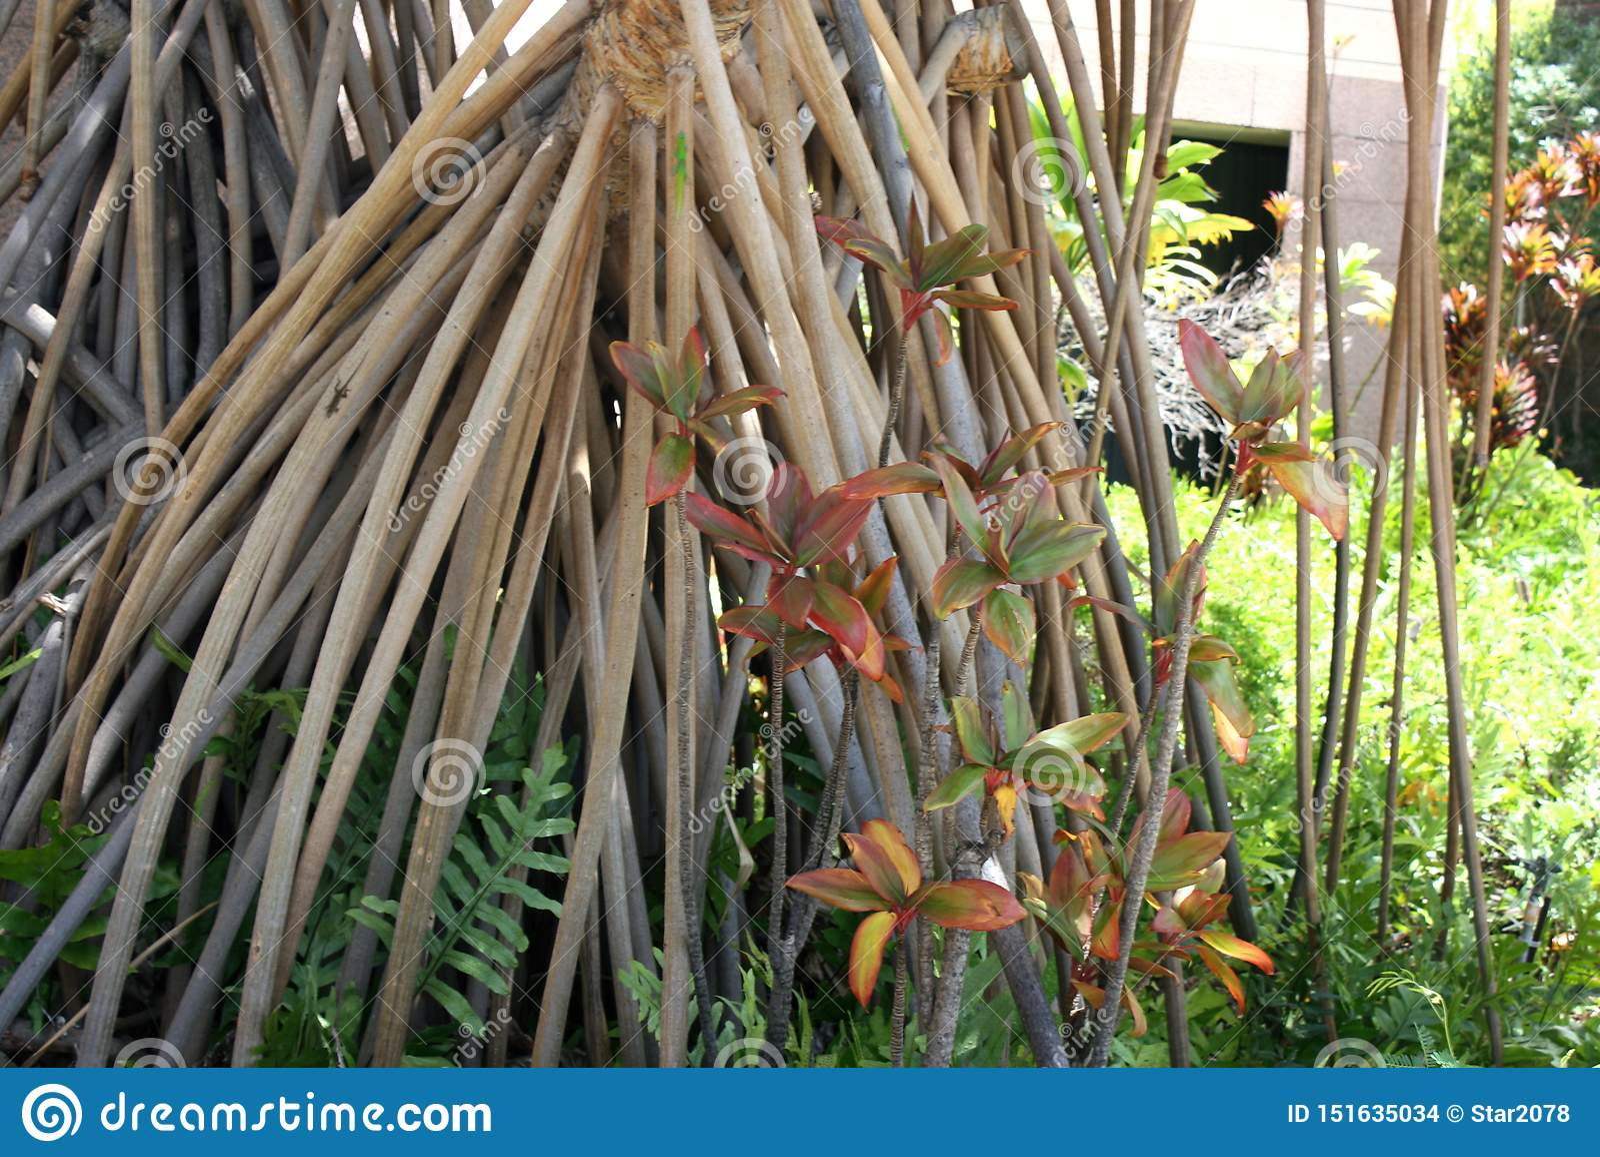 Close up of a Hala Tree prop roots